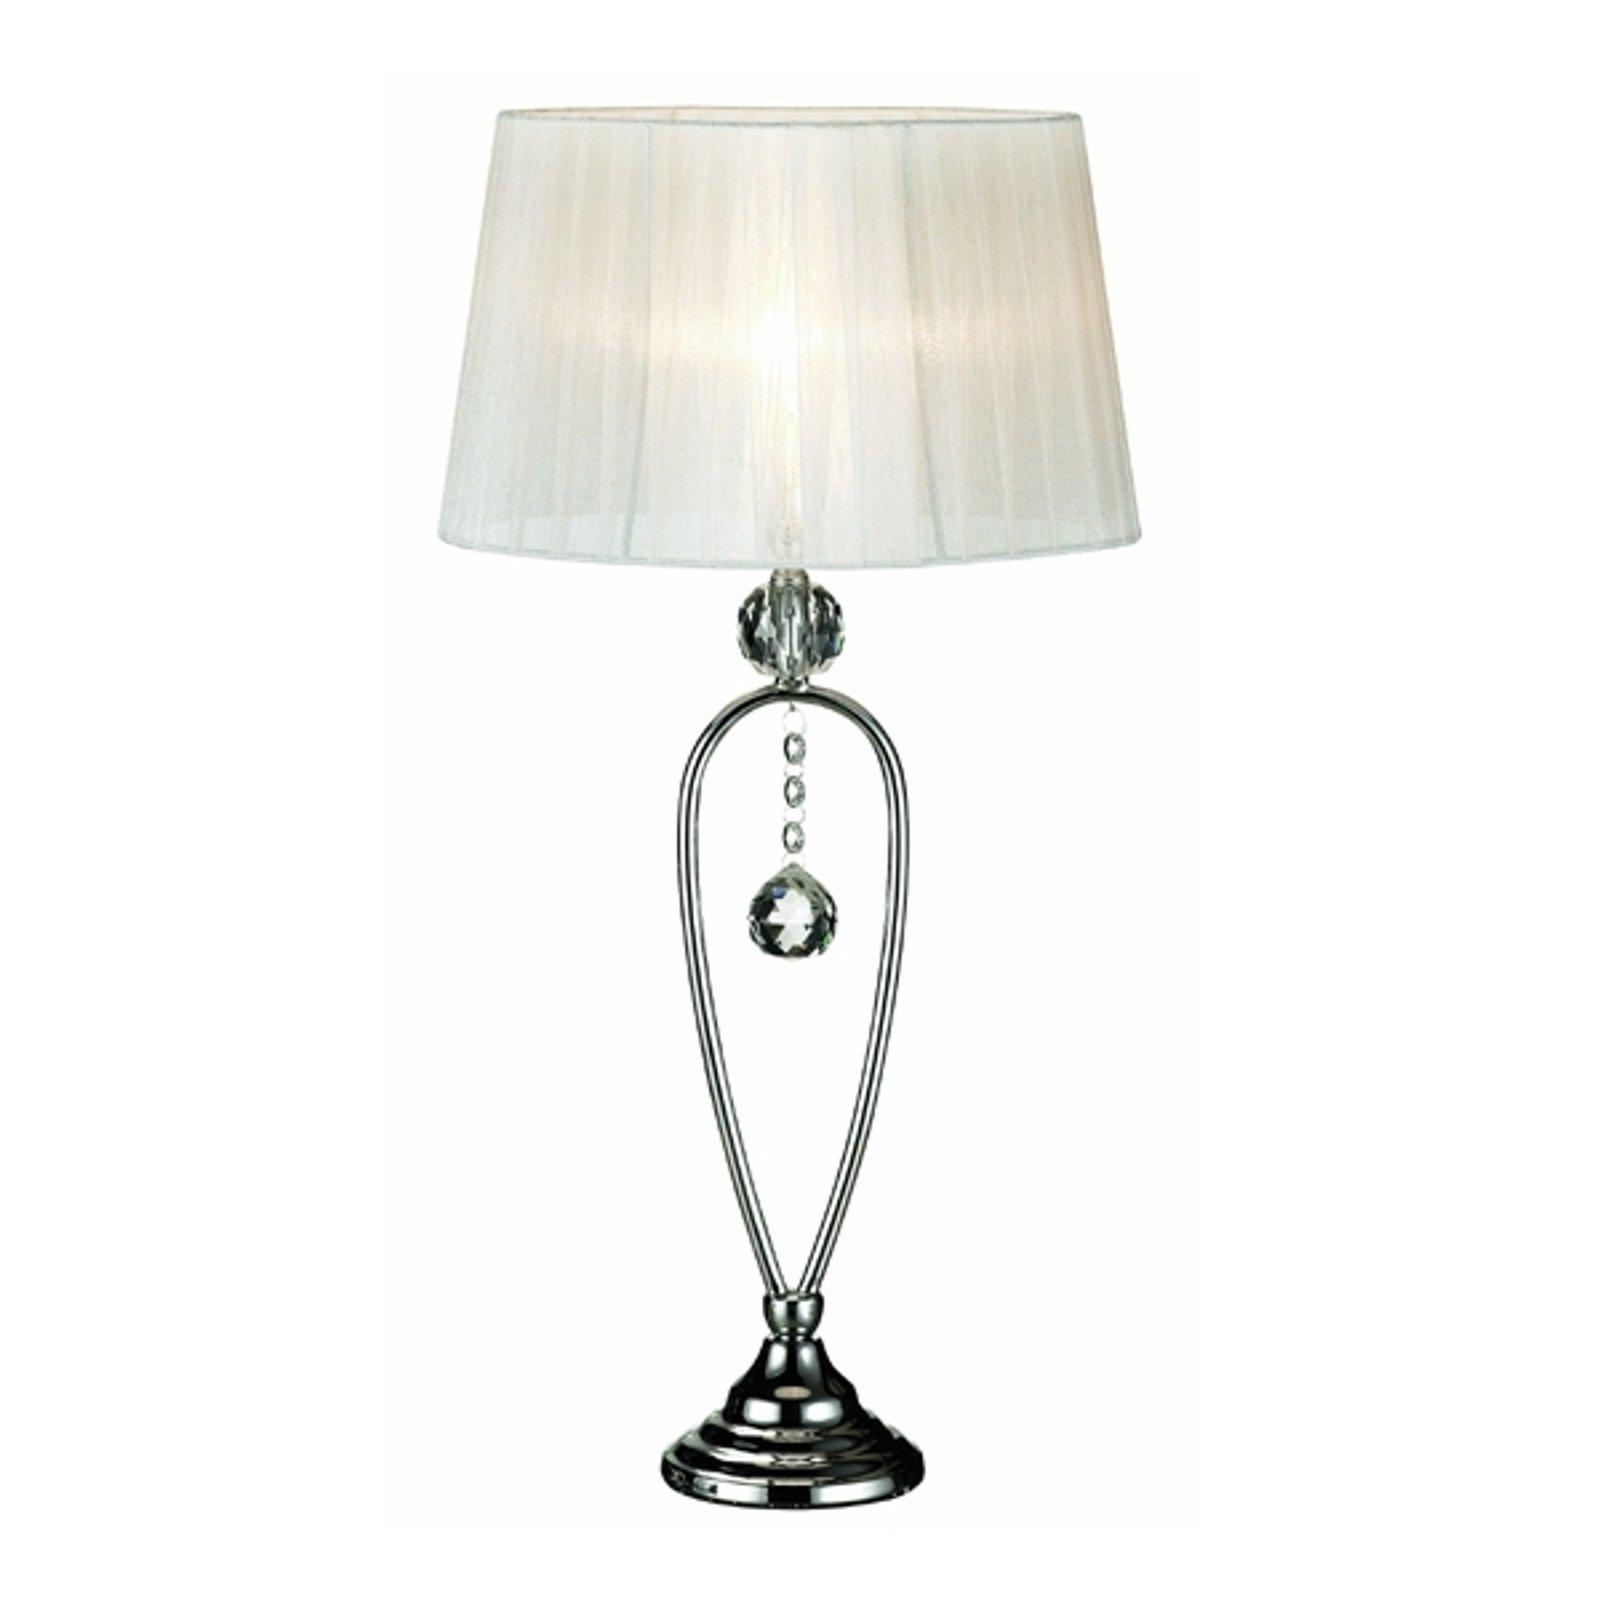 Elegant briljant bordlampe Christinehof, hvit